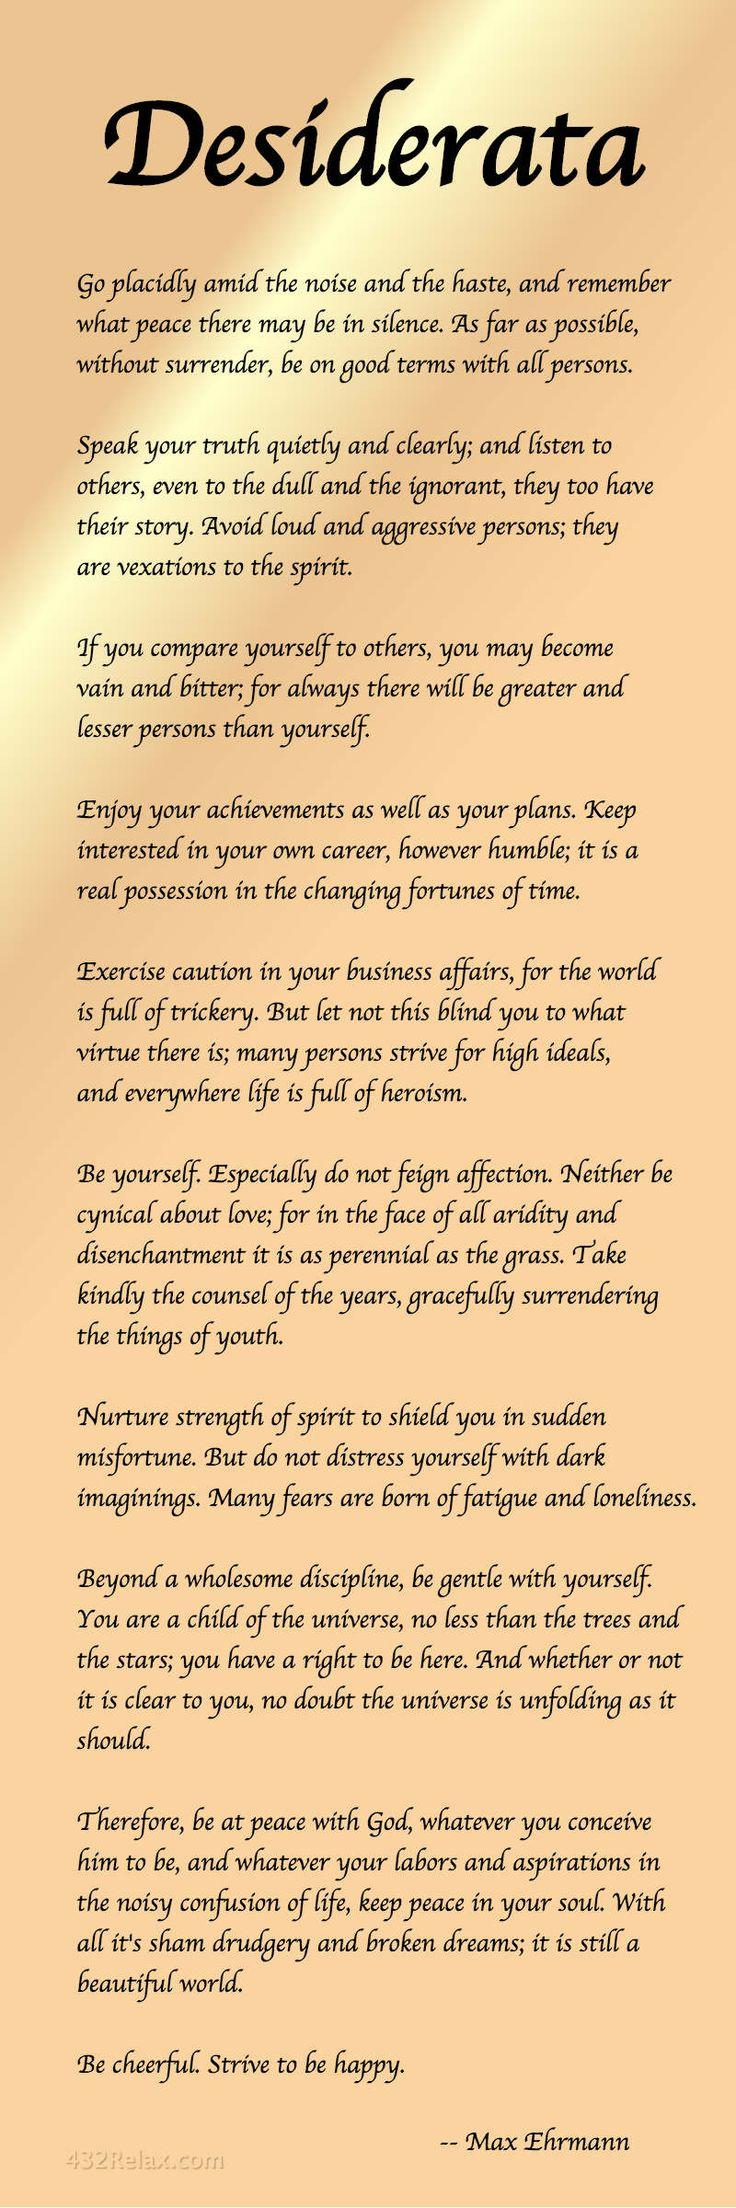 This is the Desiderata Poem by Max Ehrmann - #Desiderata #432Relax